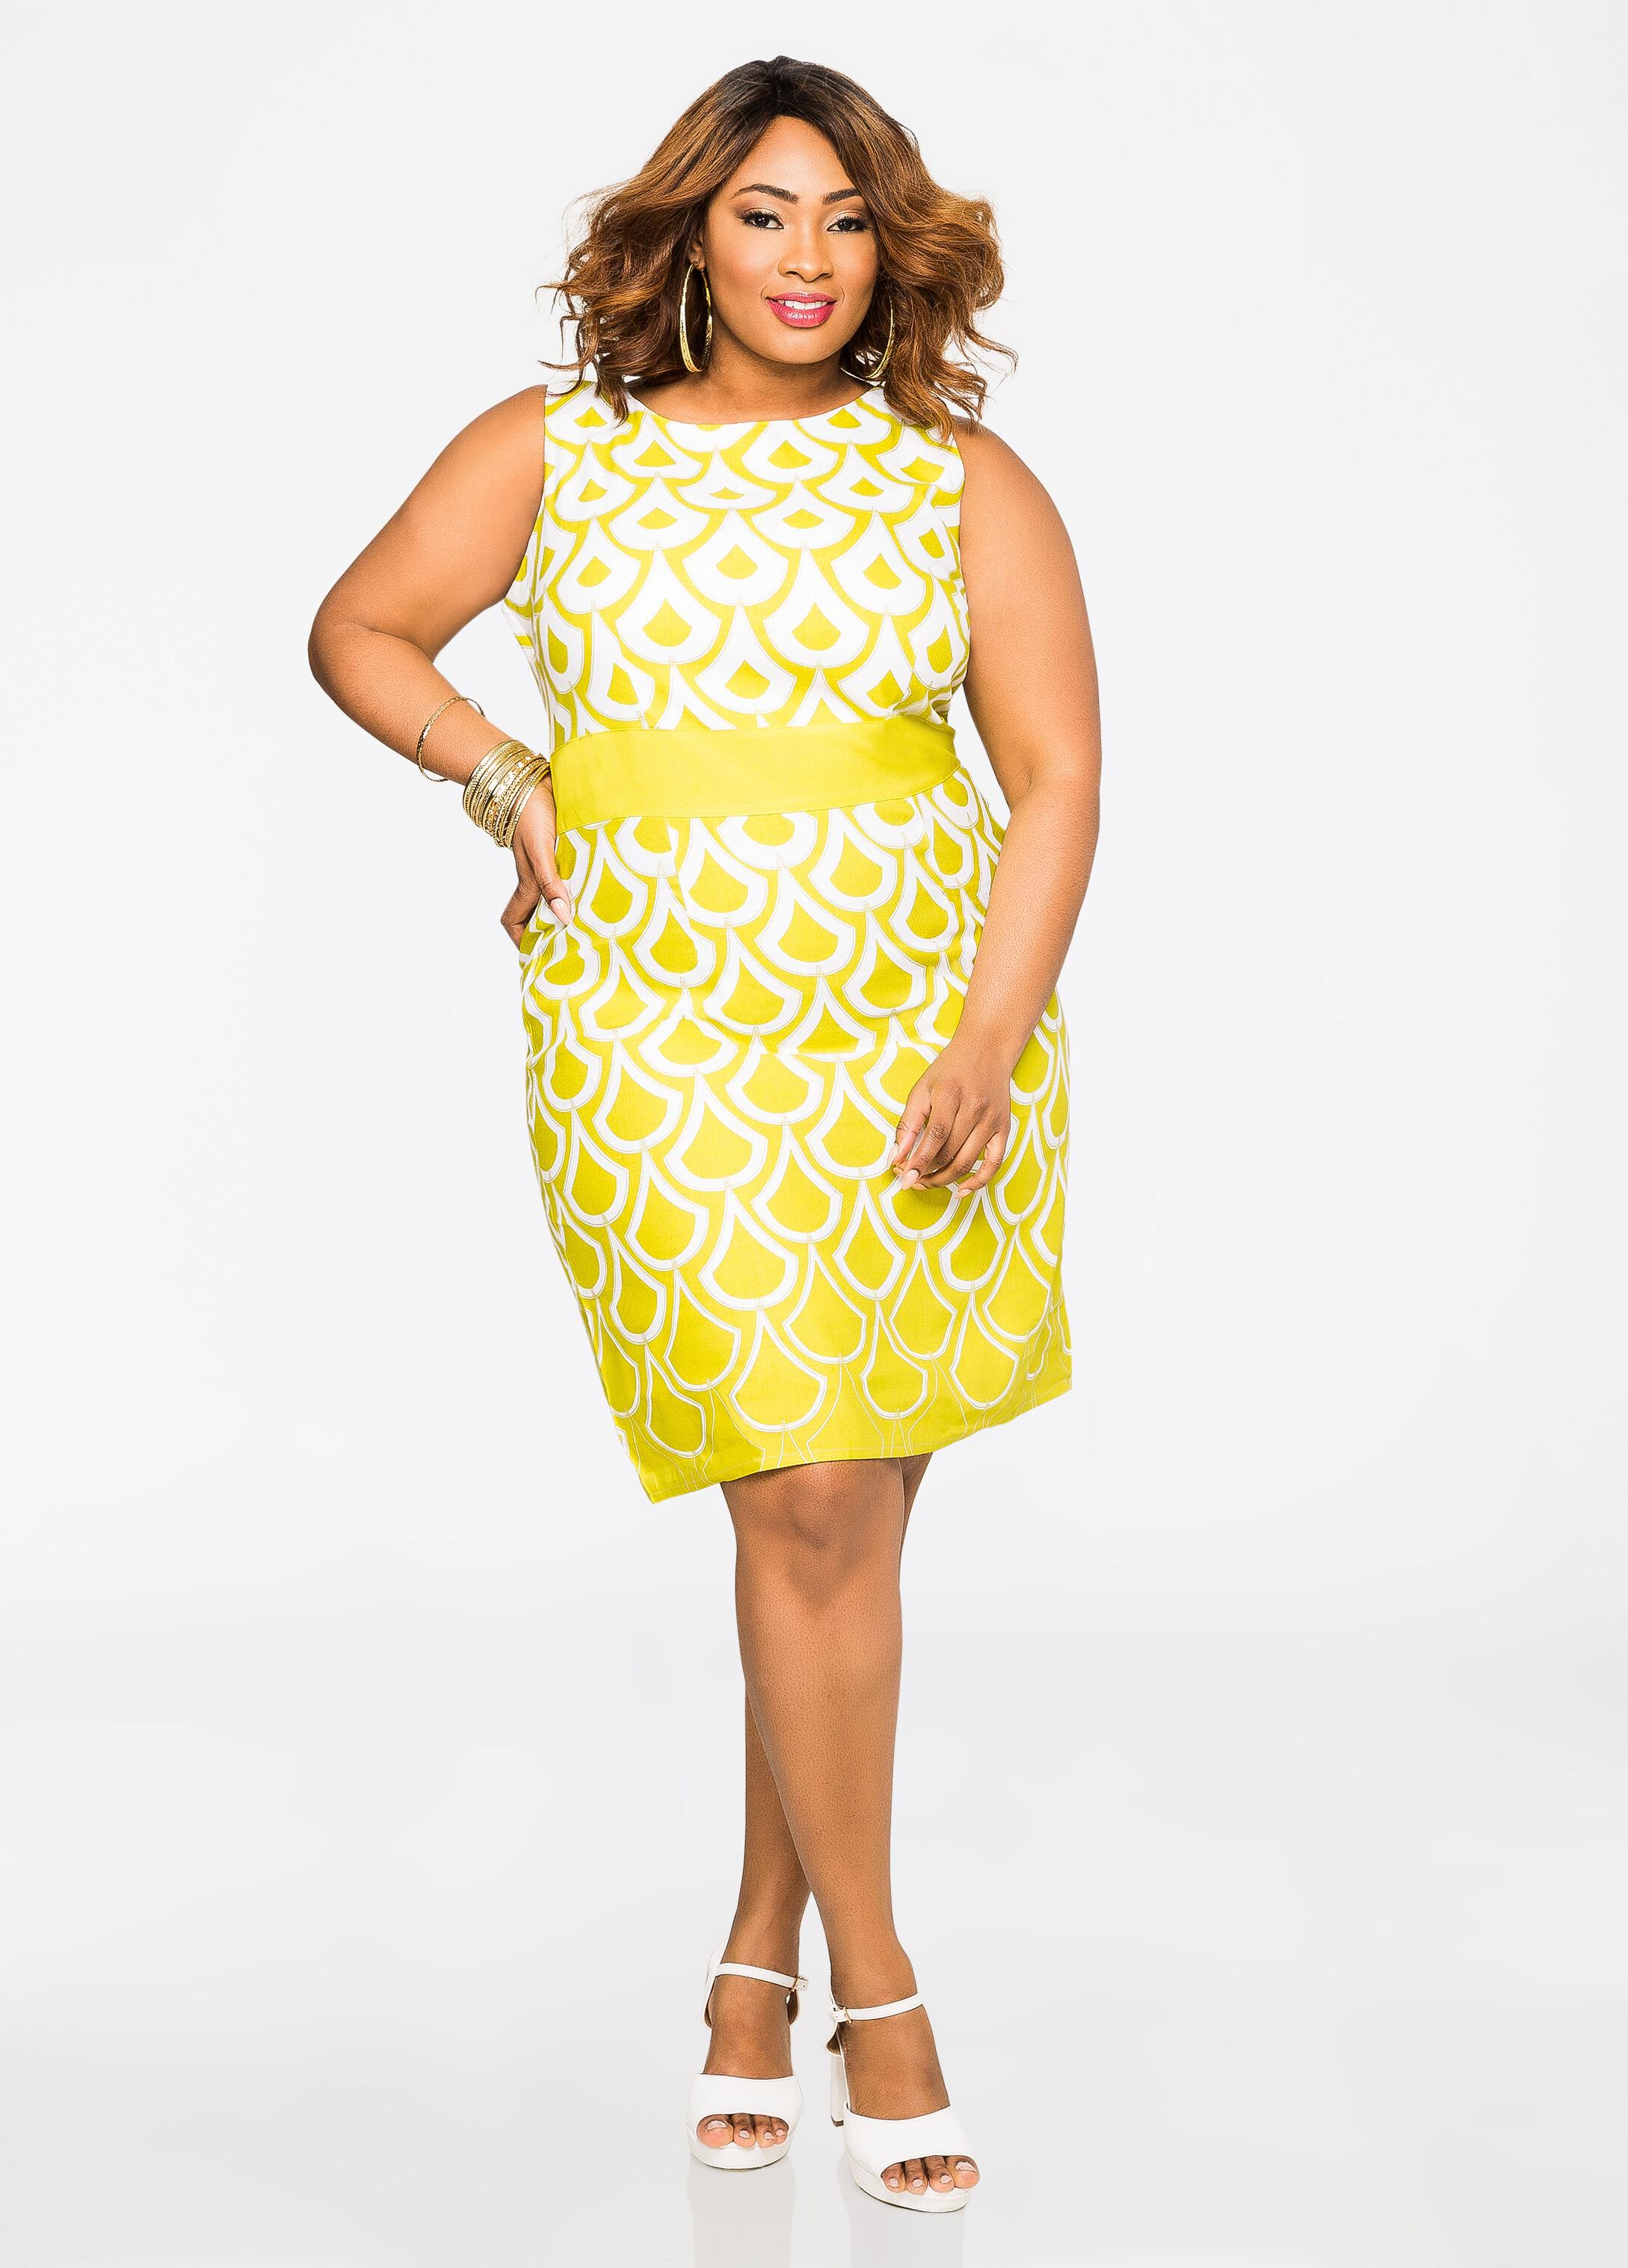 Plus Size Dresses - Mod Teardrop Linen Dress - 010-NC-2417